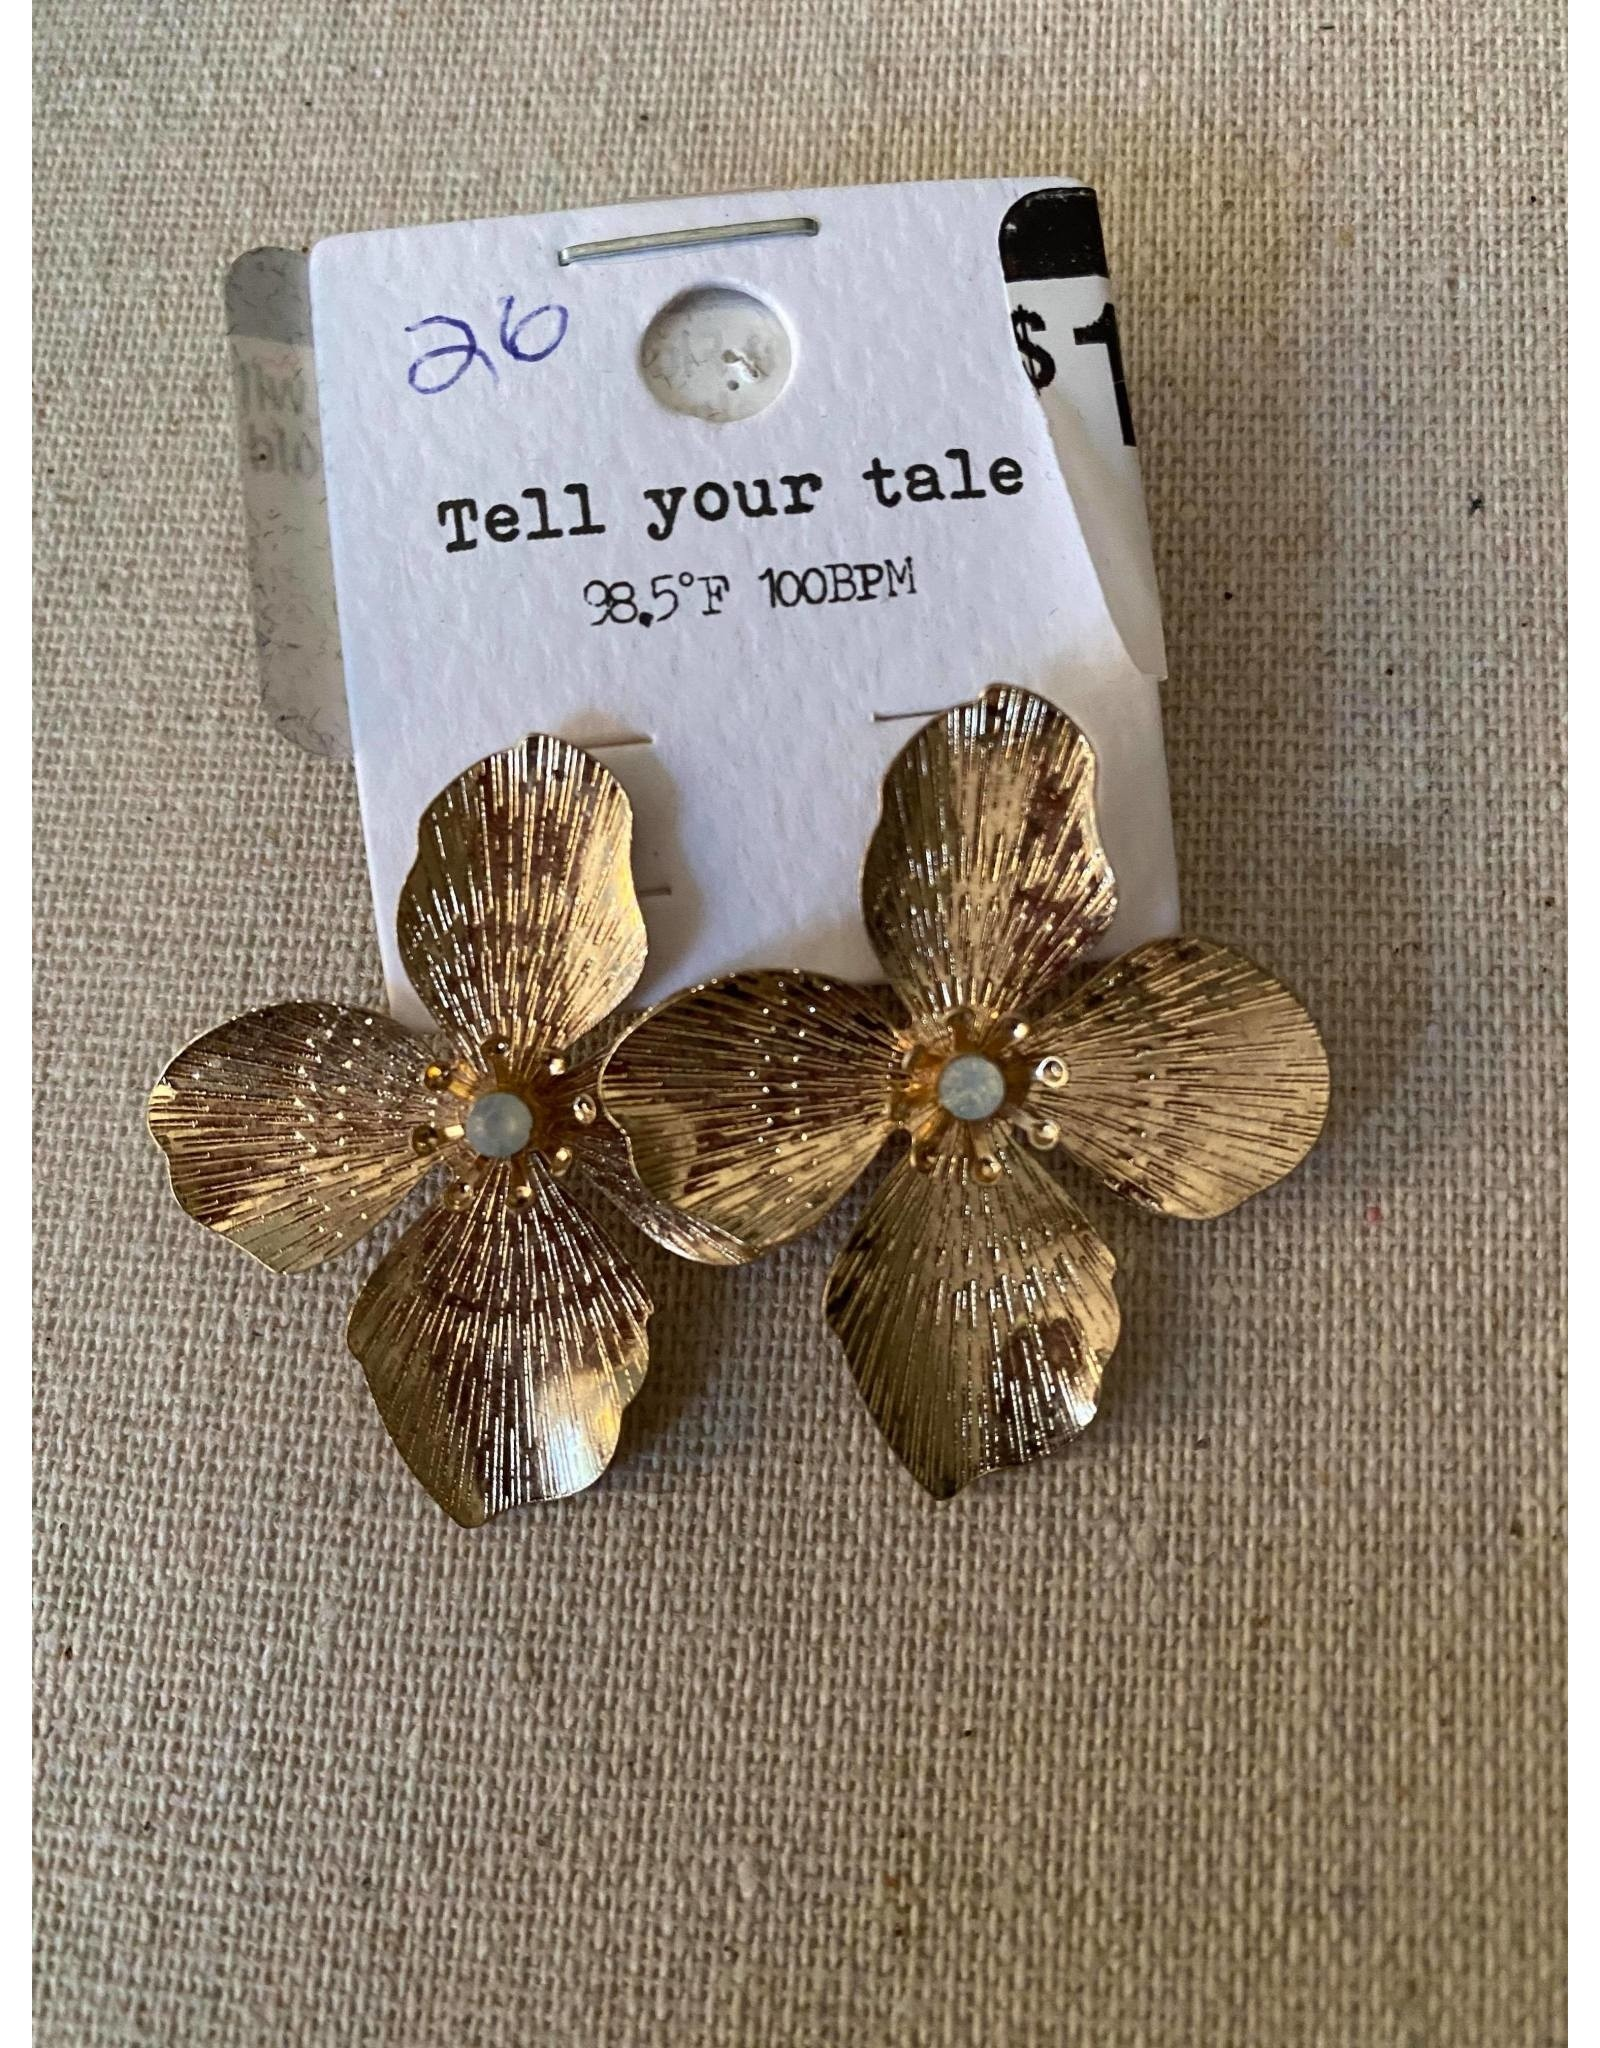 Metal Flower Earrings with rhinestone in Center